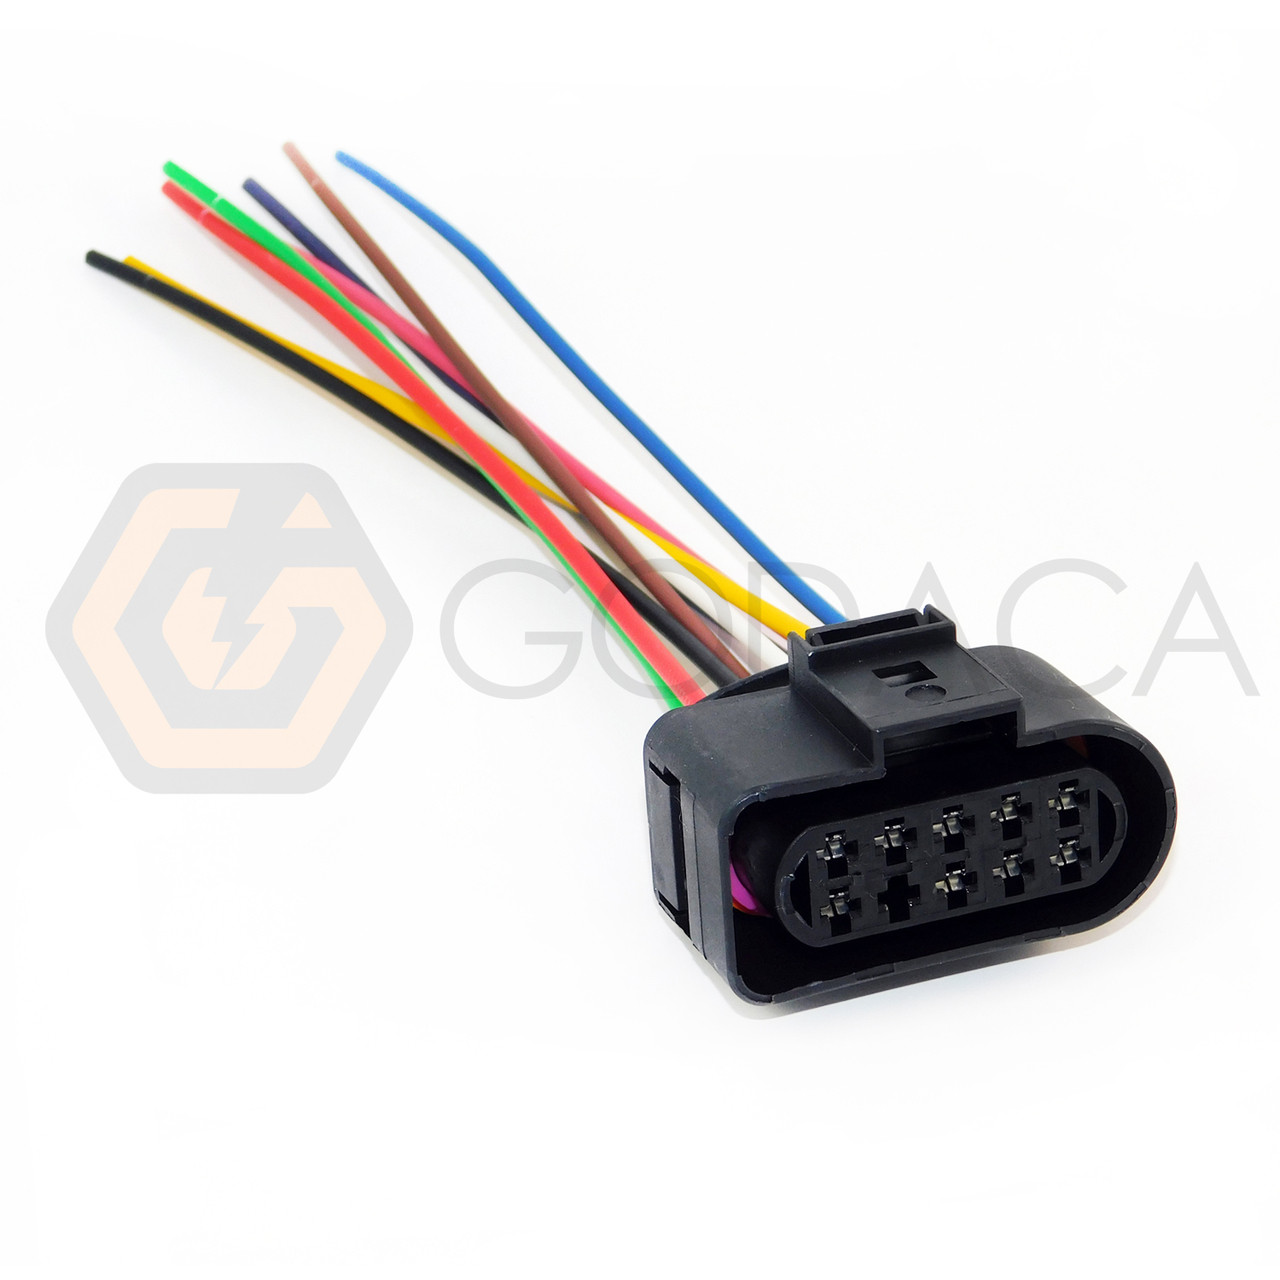 medium resolution of 1 x connector headlight for audi vw seat skoda 1j0973735 1j0 973 735 9 way ford godaca llc